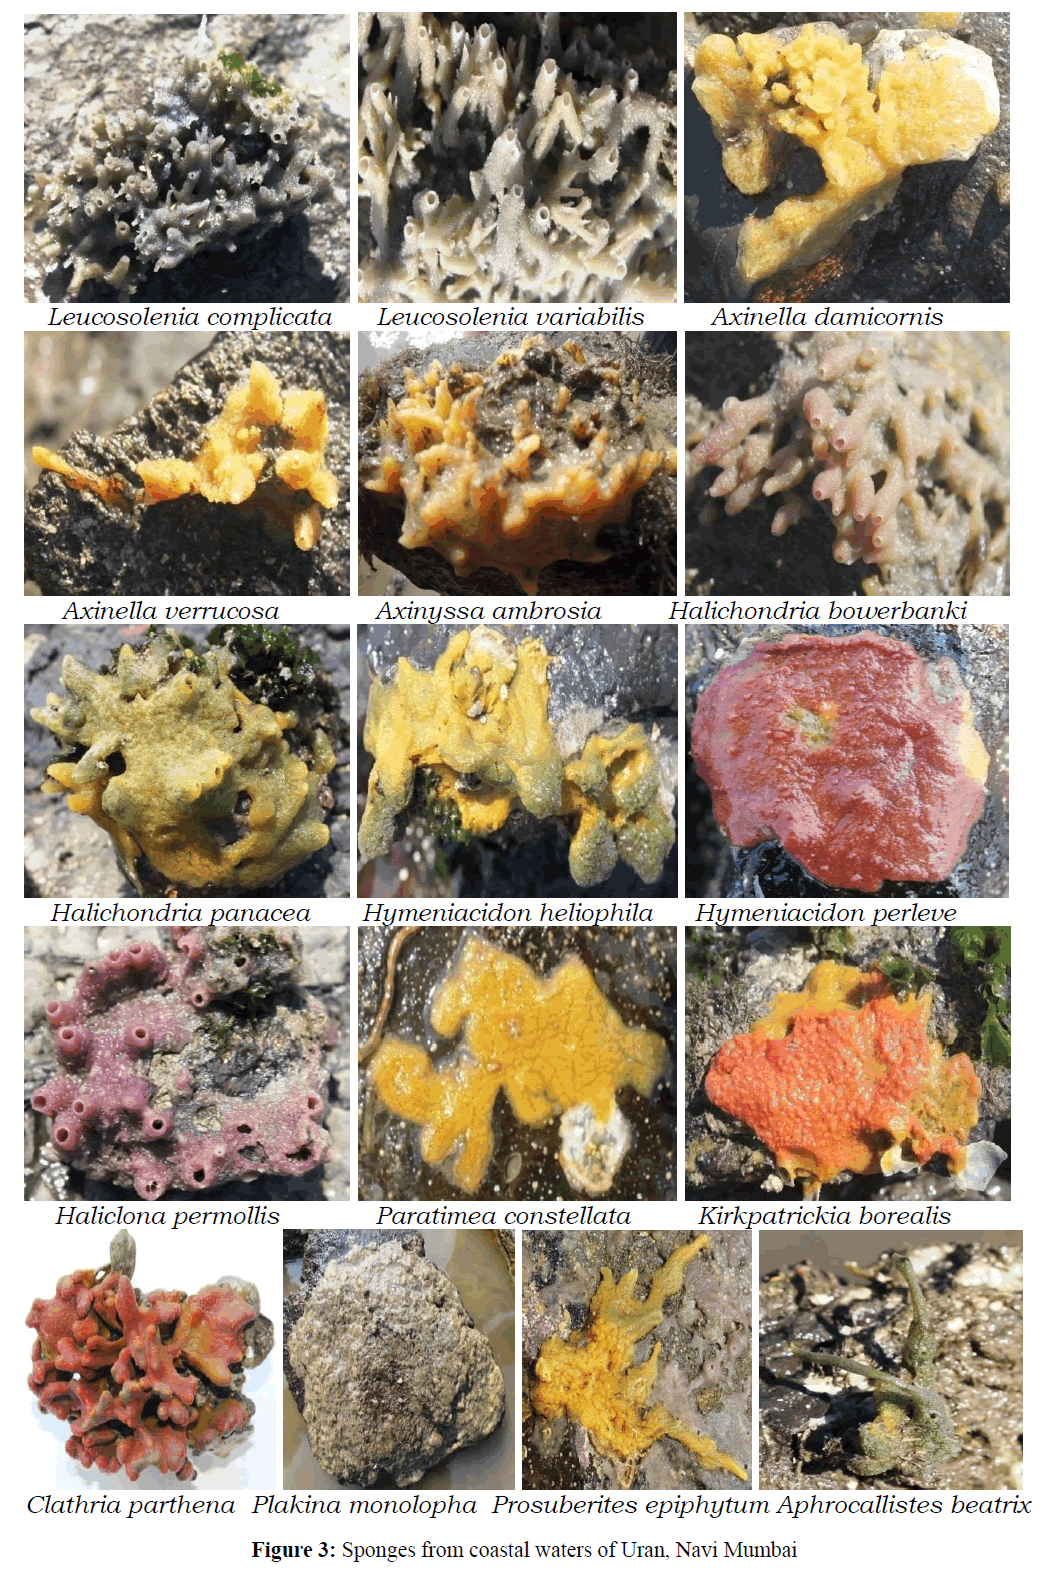 Pure-Applied-Zoology-Sponges-coastal